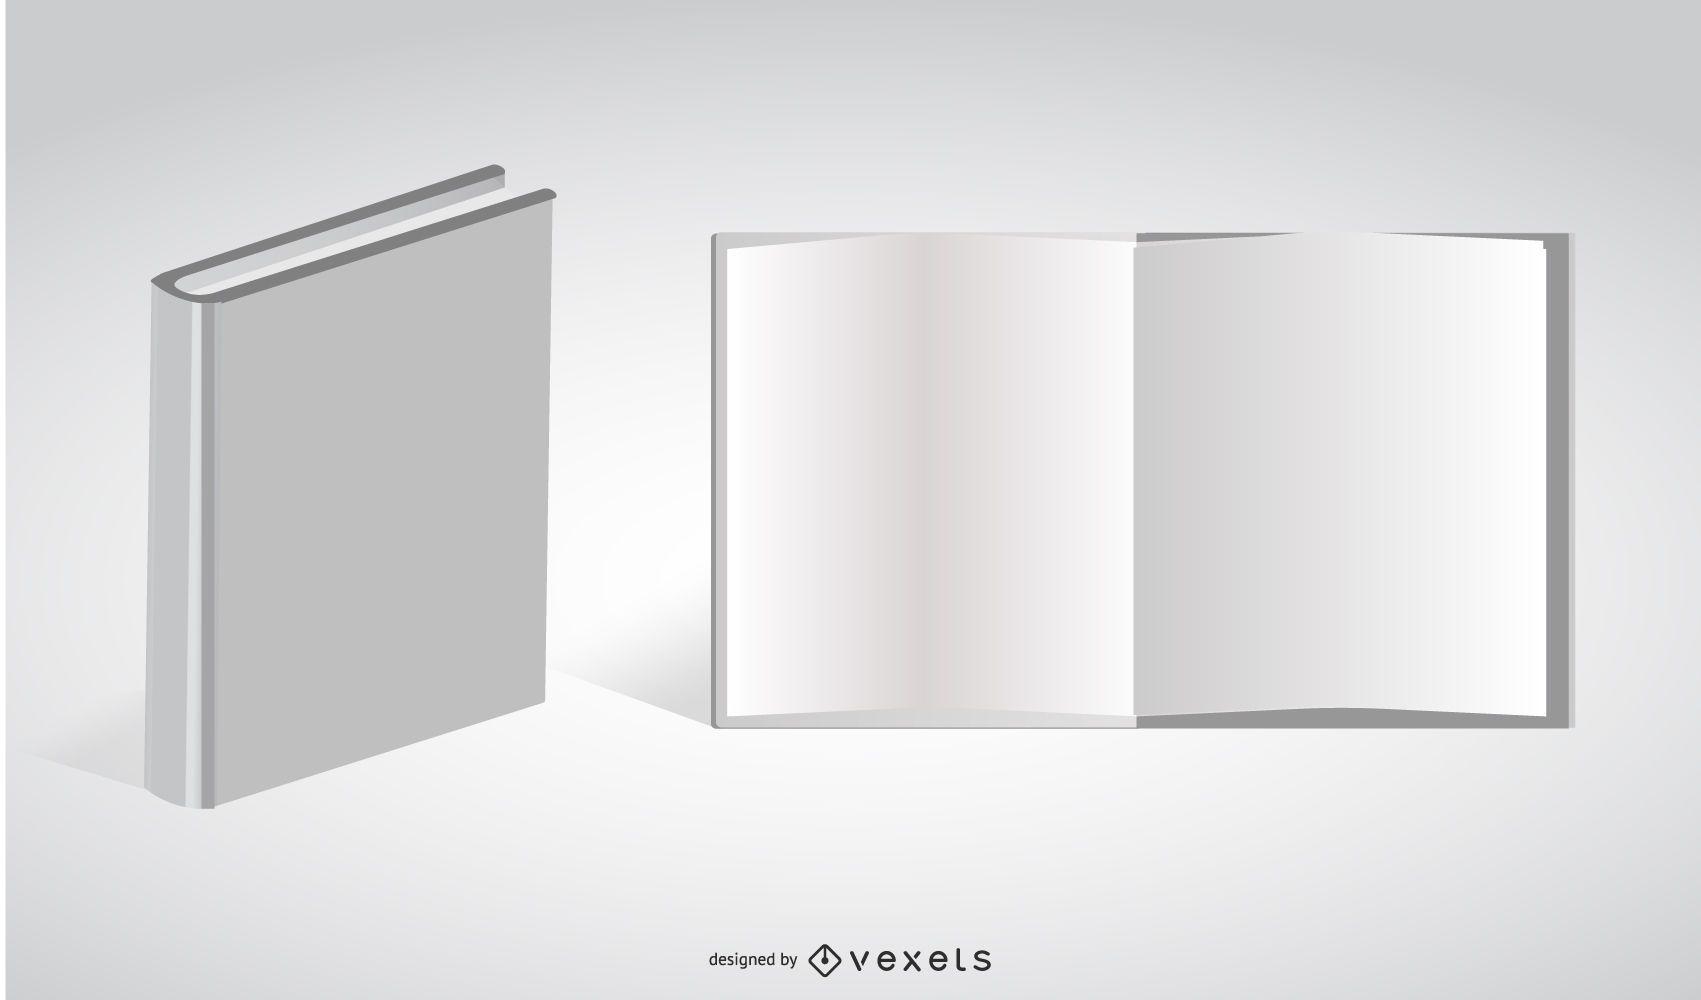 Livro Branco do Vetor